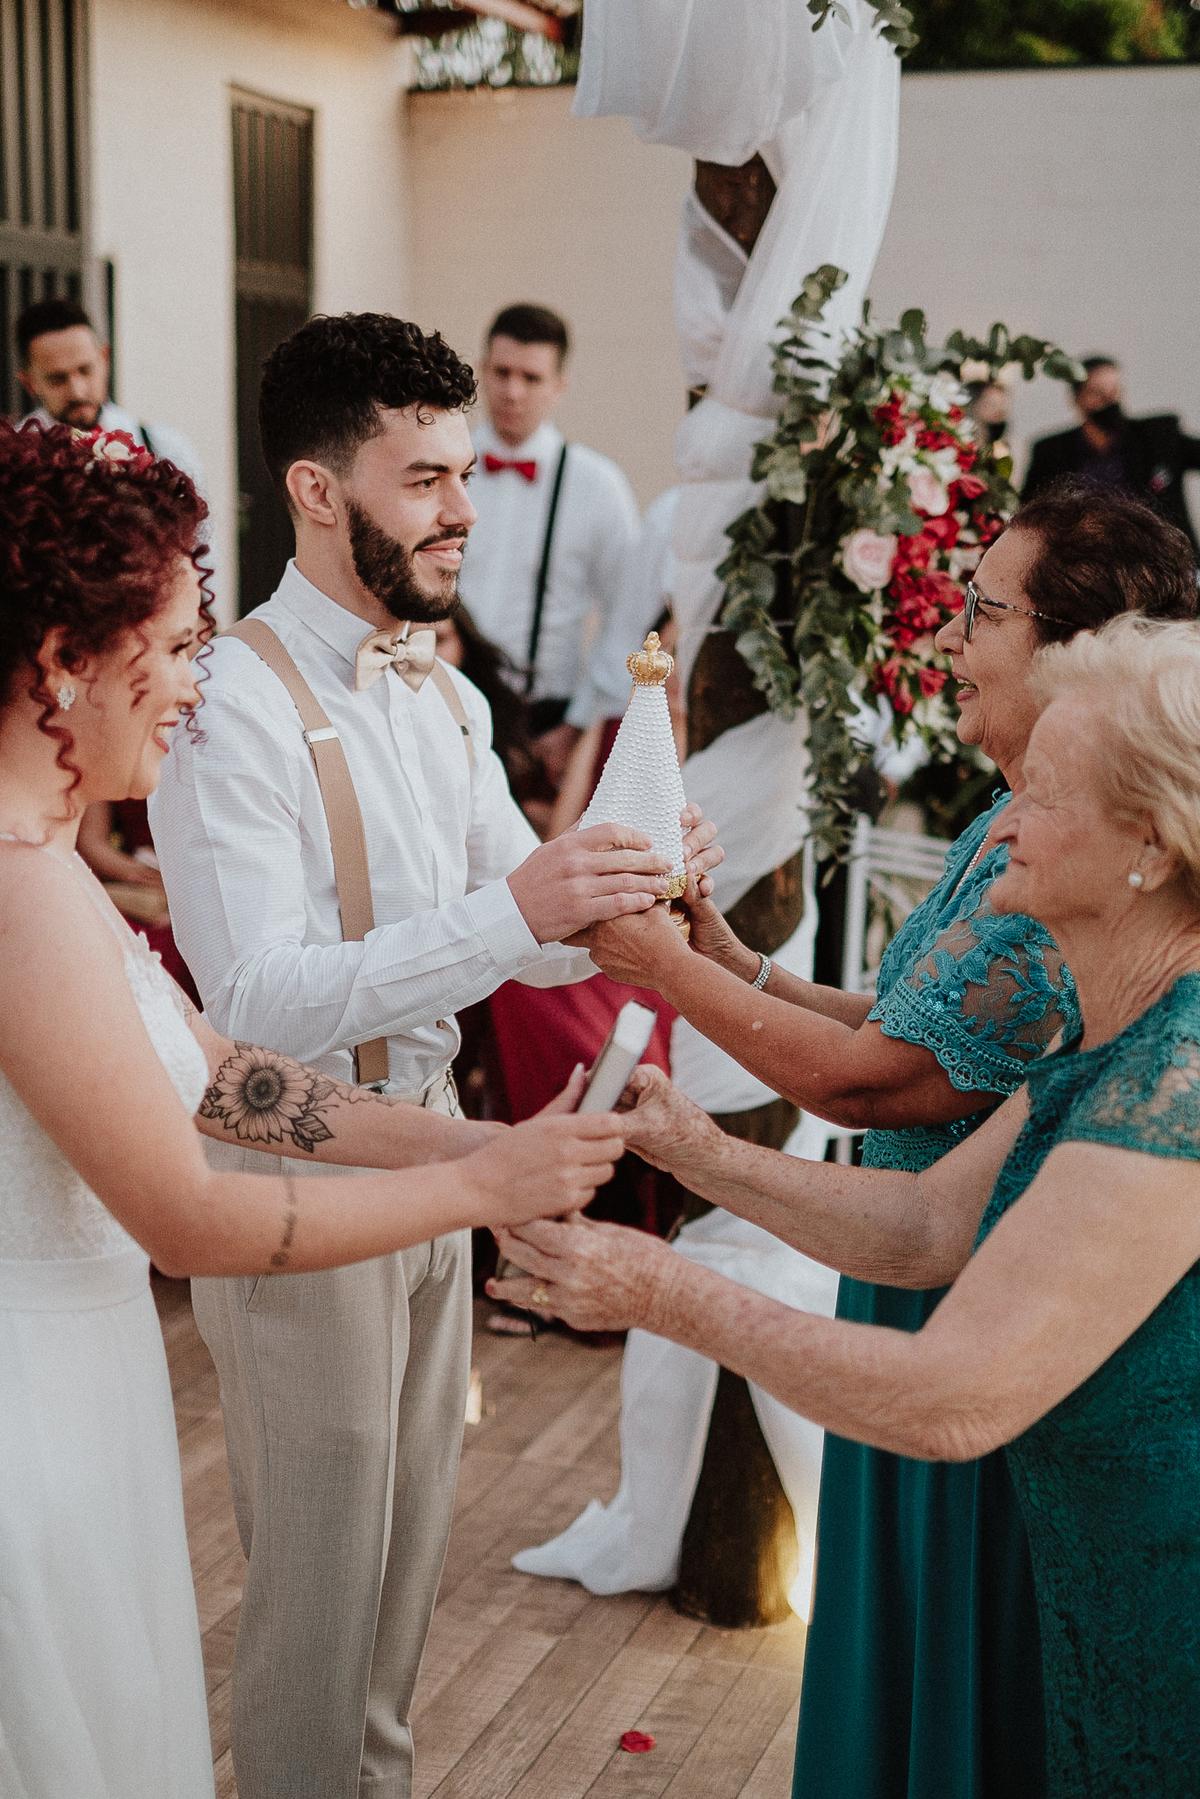 trajes de noivos ideias para casar casamentos com estilo fotos por ch caio henrique fotografo de casamento  noivos sorrindo